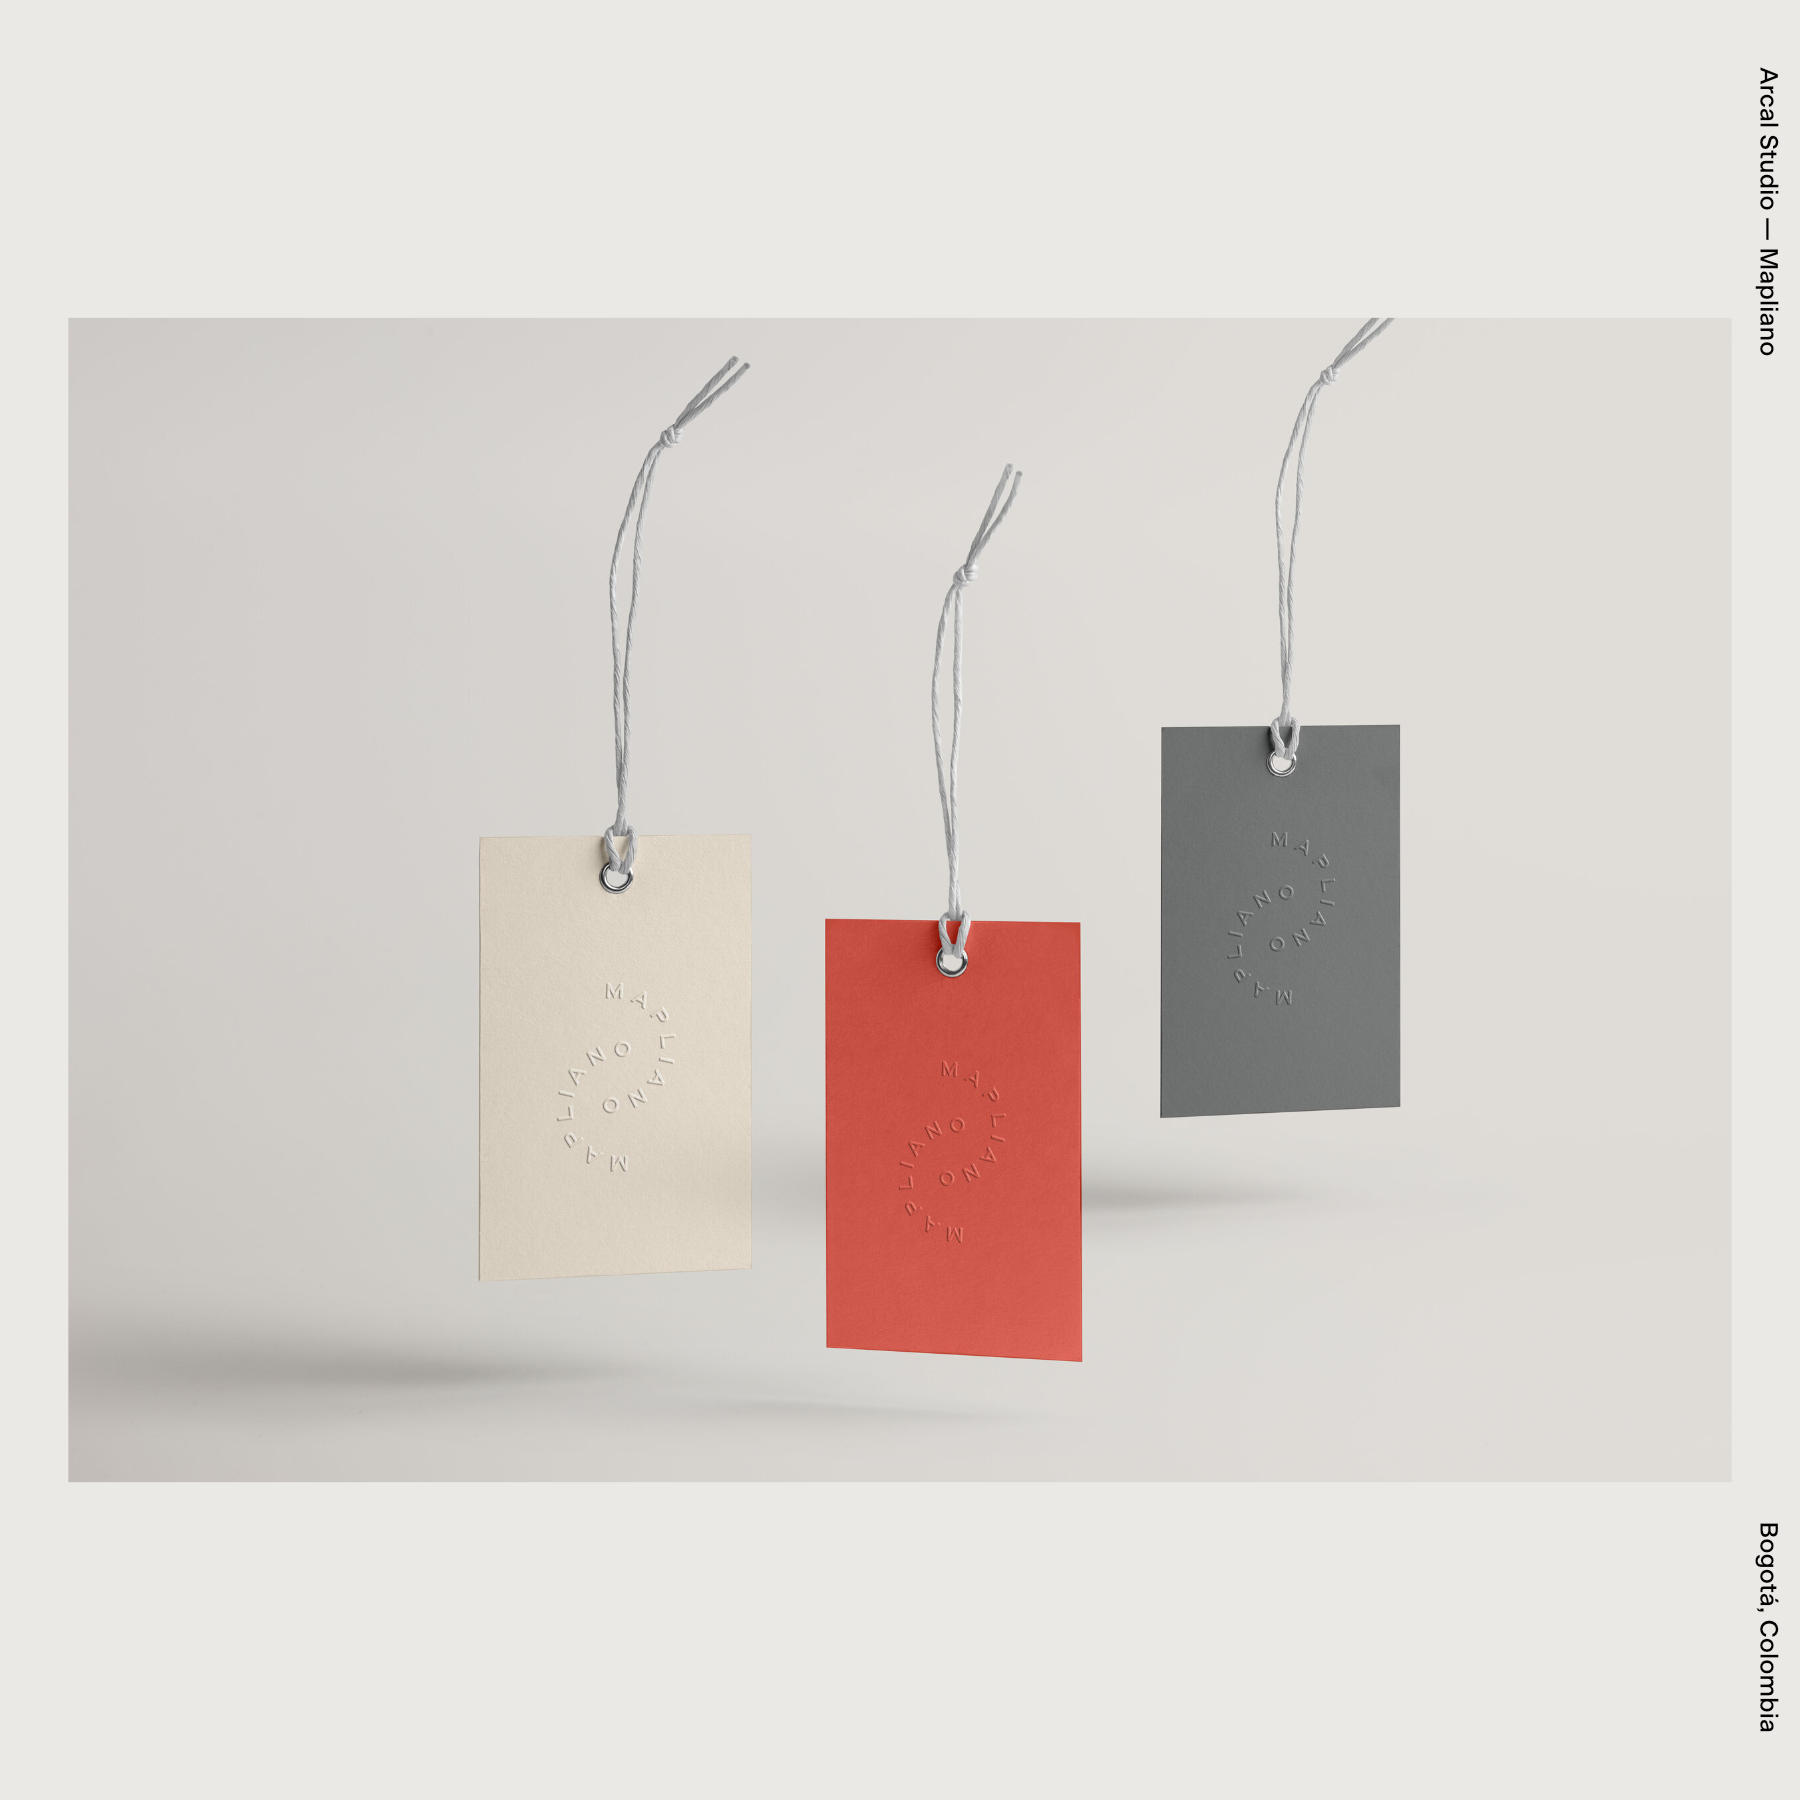 Arcal Studio — Mapliano